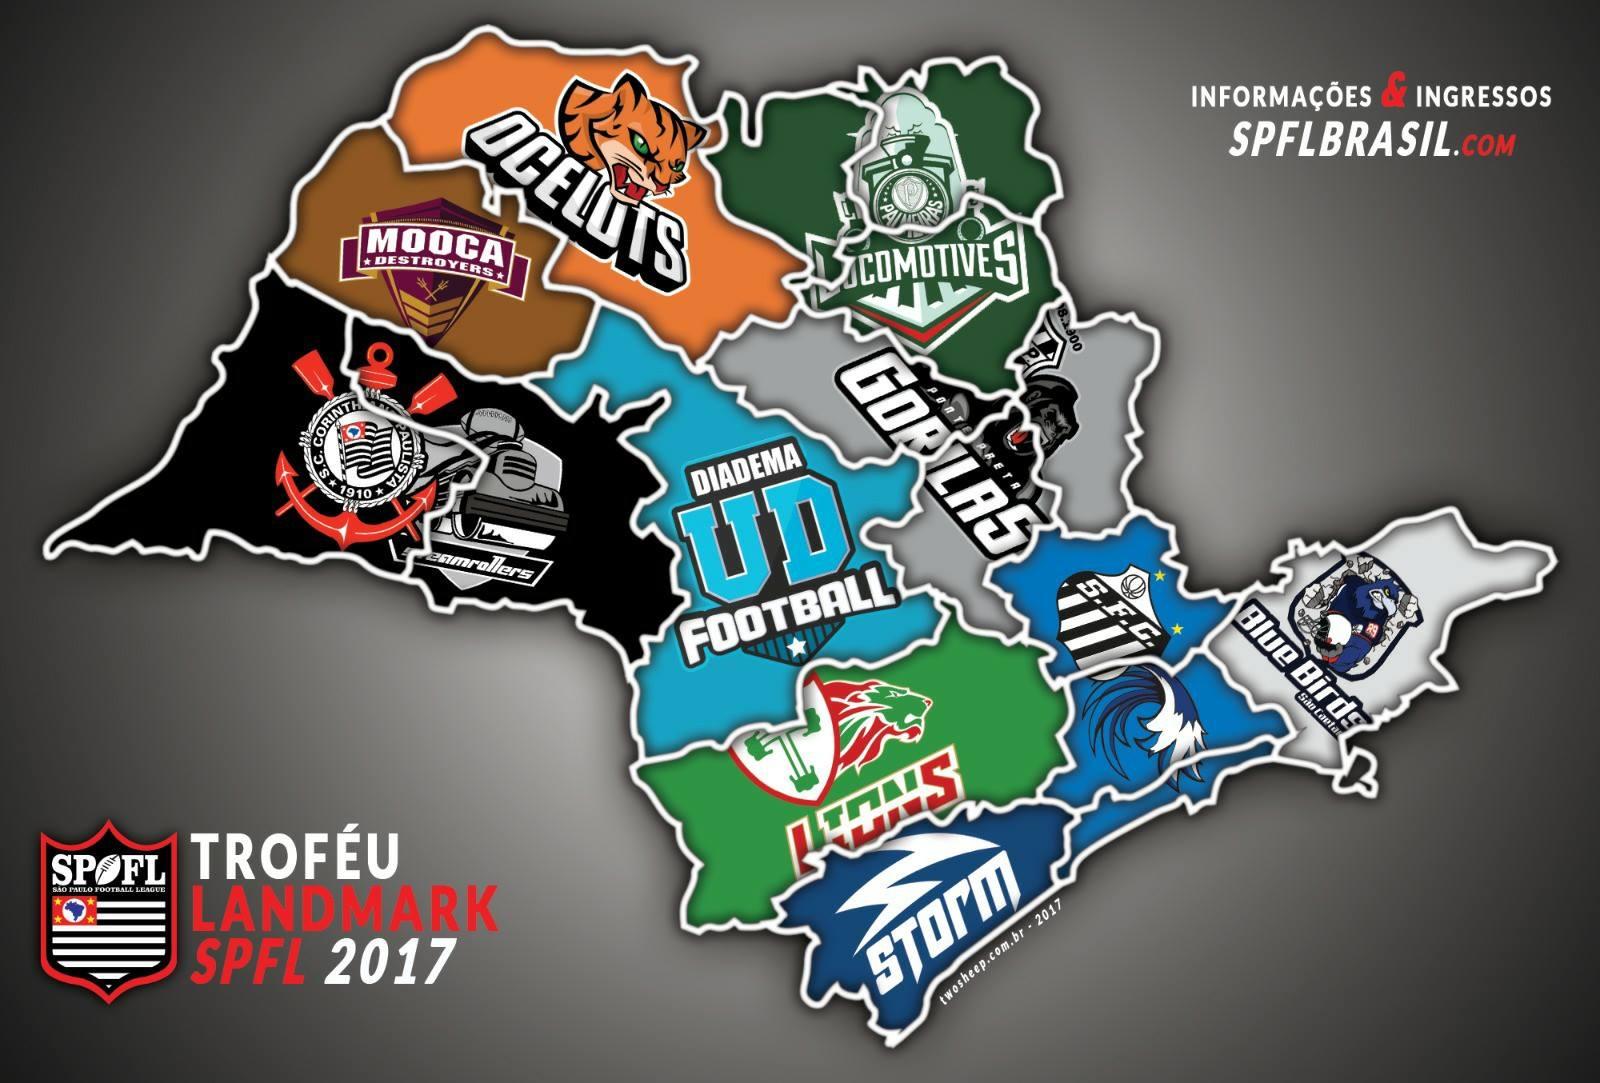 SPFL 2017 Troféu Landmark